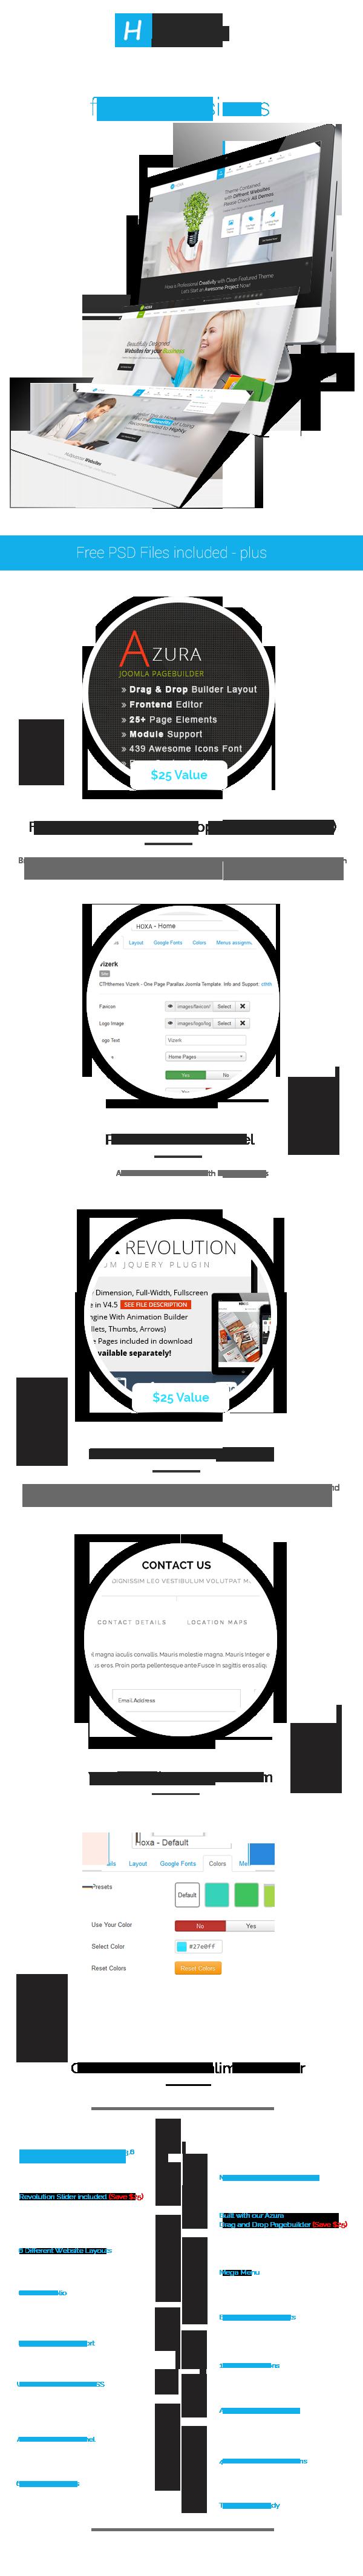 description - Hoxa - Responsive Multipurpose Joomla Template